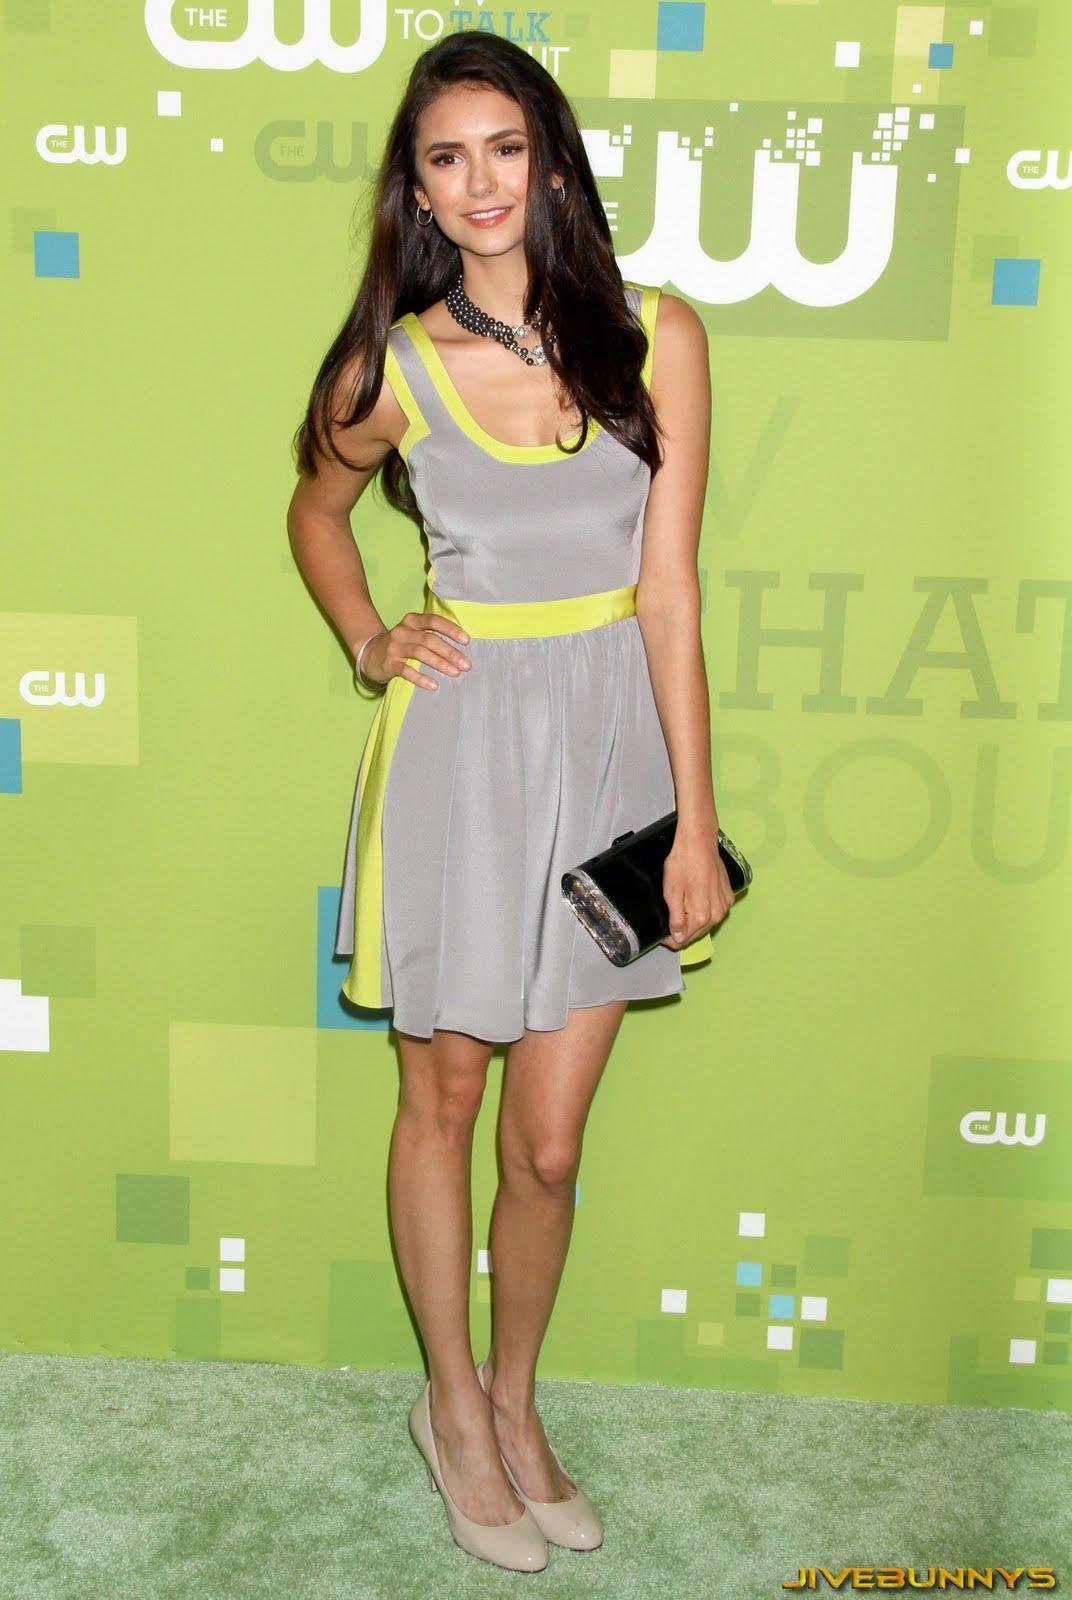 http://2.bp.blogspot.com/-J13d2rHCyxk/TdkdgNL2S4I/AAAAAAACFE0/BwWGUsez2mY/s1600/nina-dobrev-actress-439.jpg